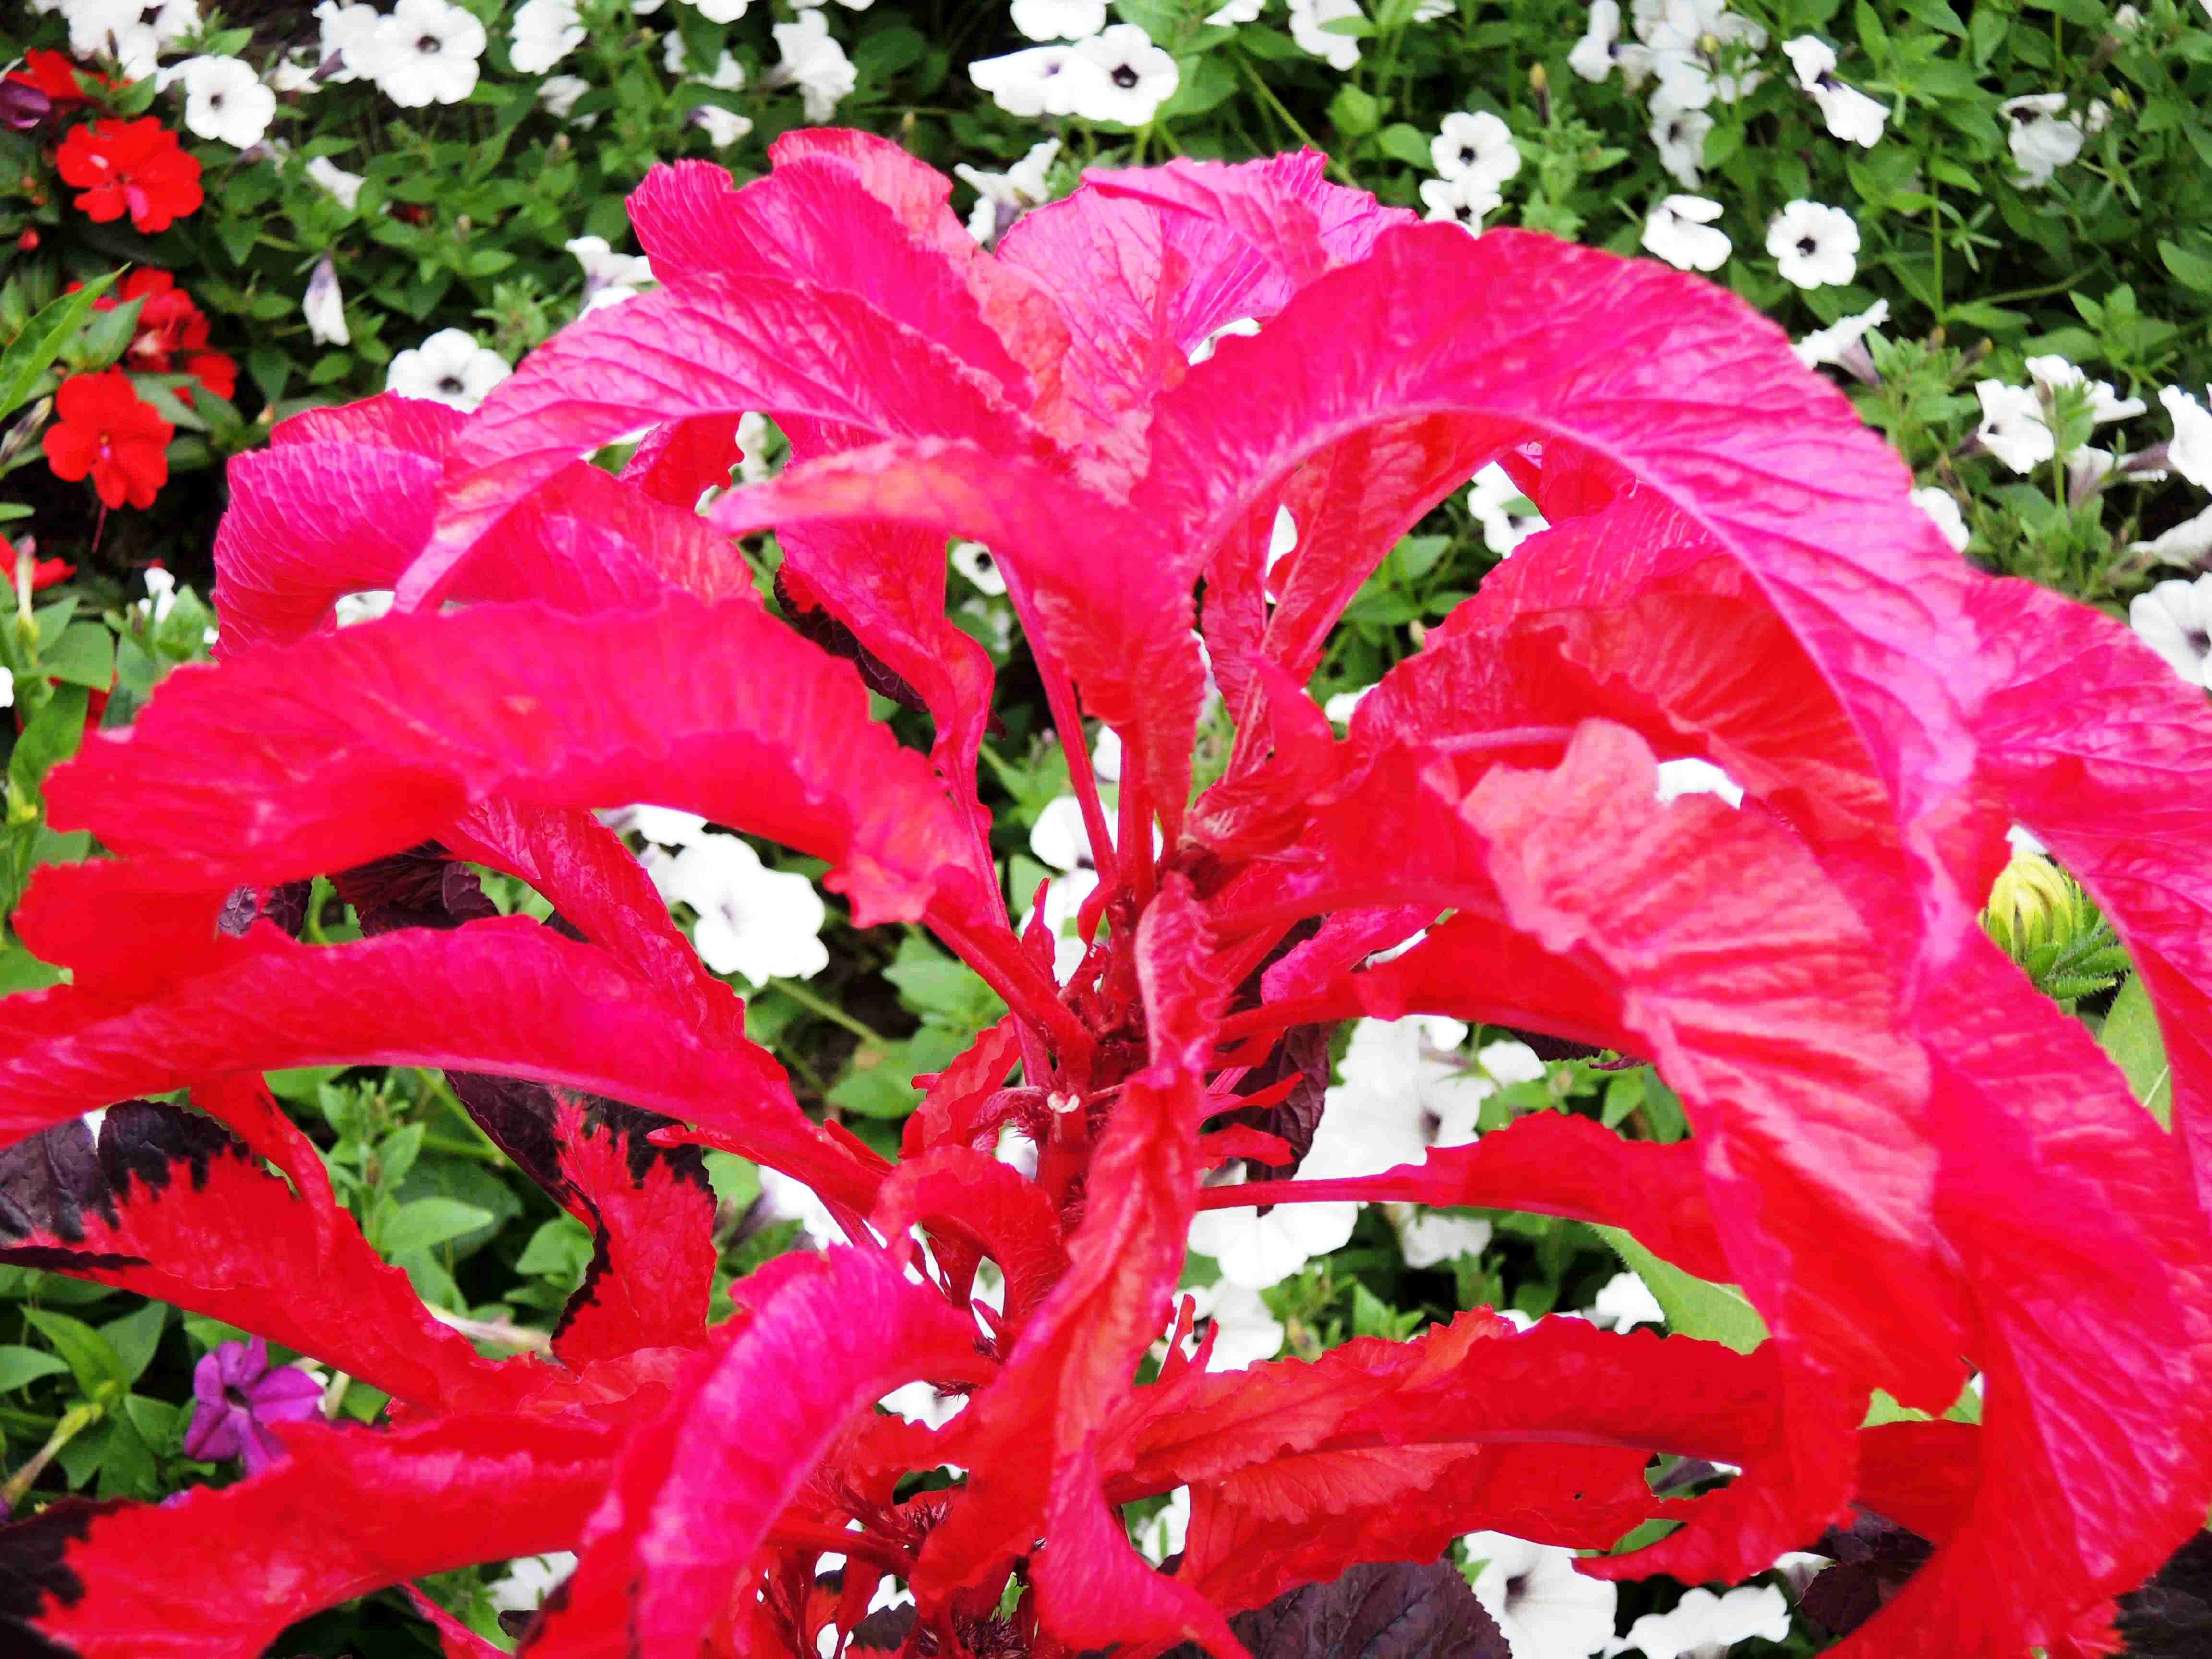 Amaranthus-Tricolor-Early-Splendor2Amaranthacees